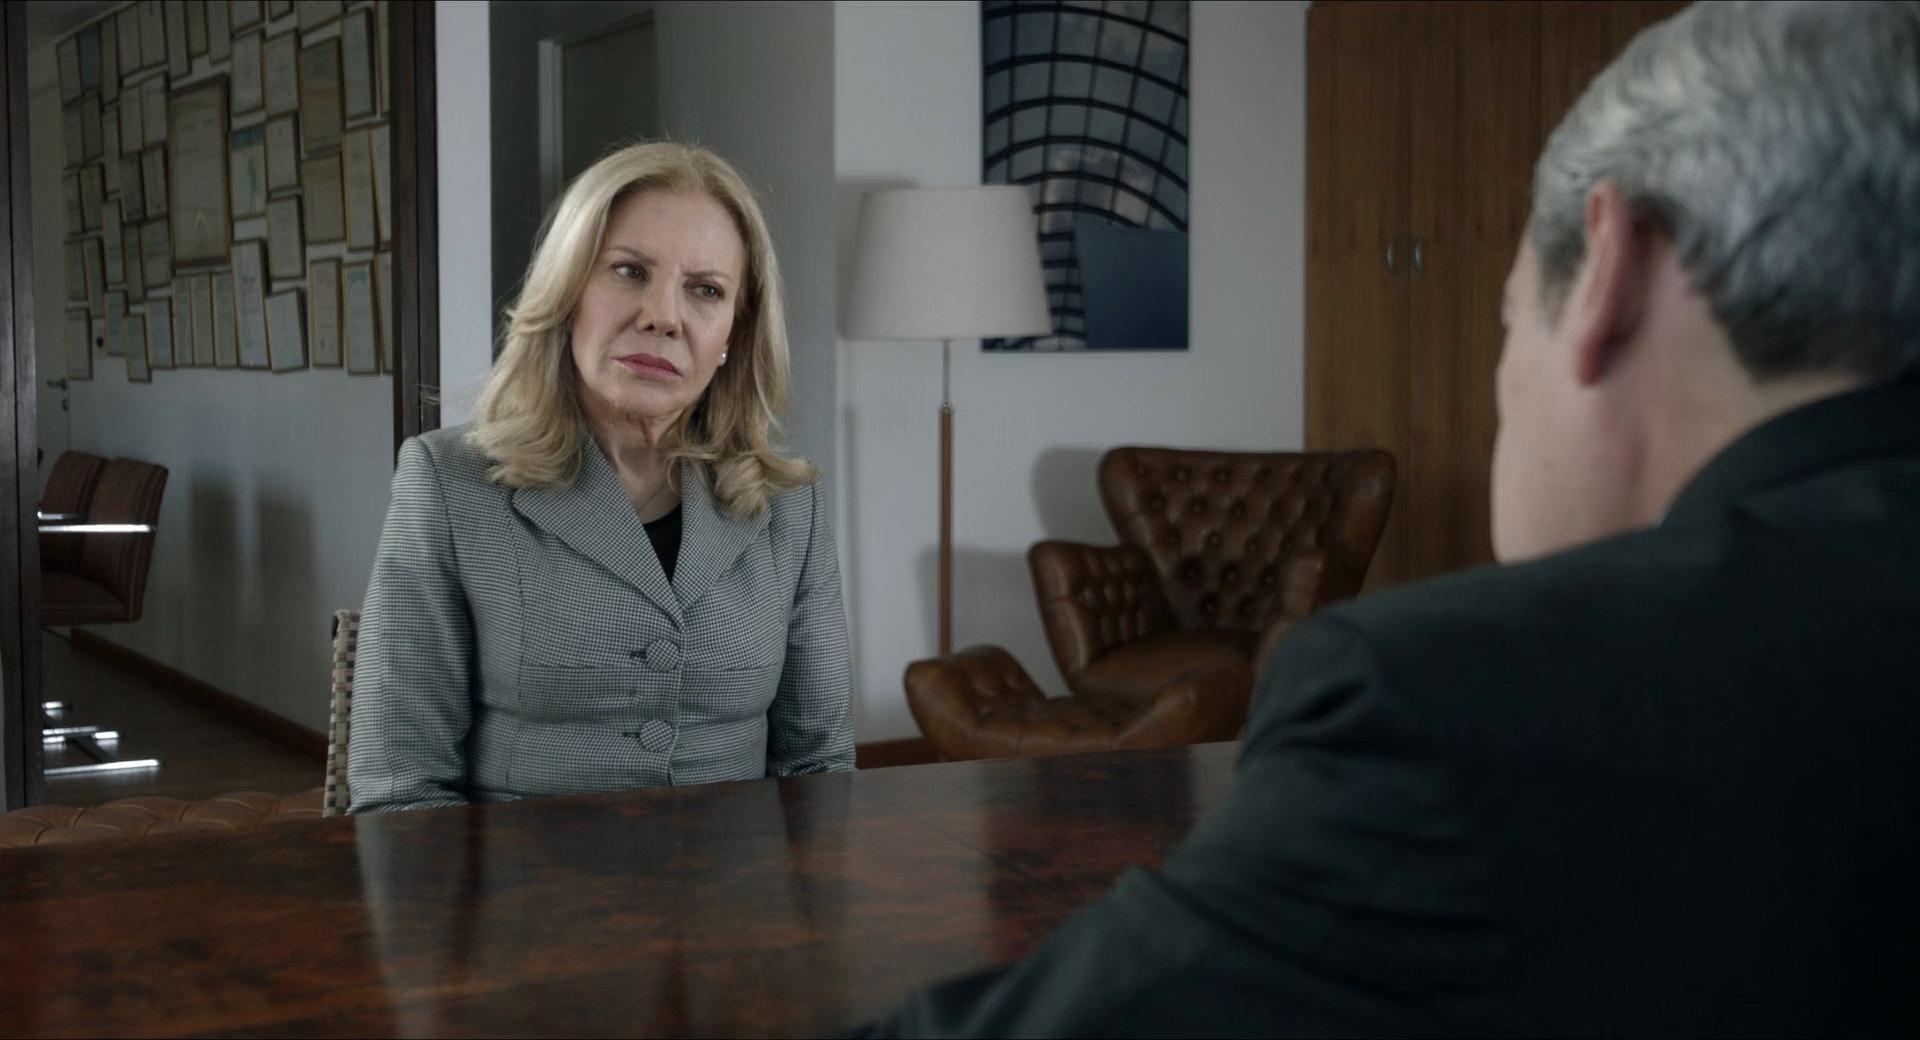 Aile Suçları | The Crimes That Bind | 2020 | WEB-DL | XviD | Türkçe Dublaj | m720p - m1080p | WEB-DL | Dual | TR-EN | Tek Link